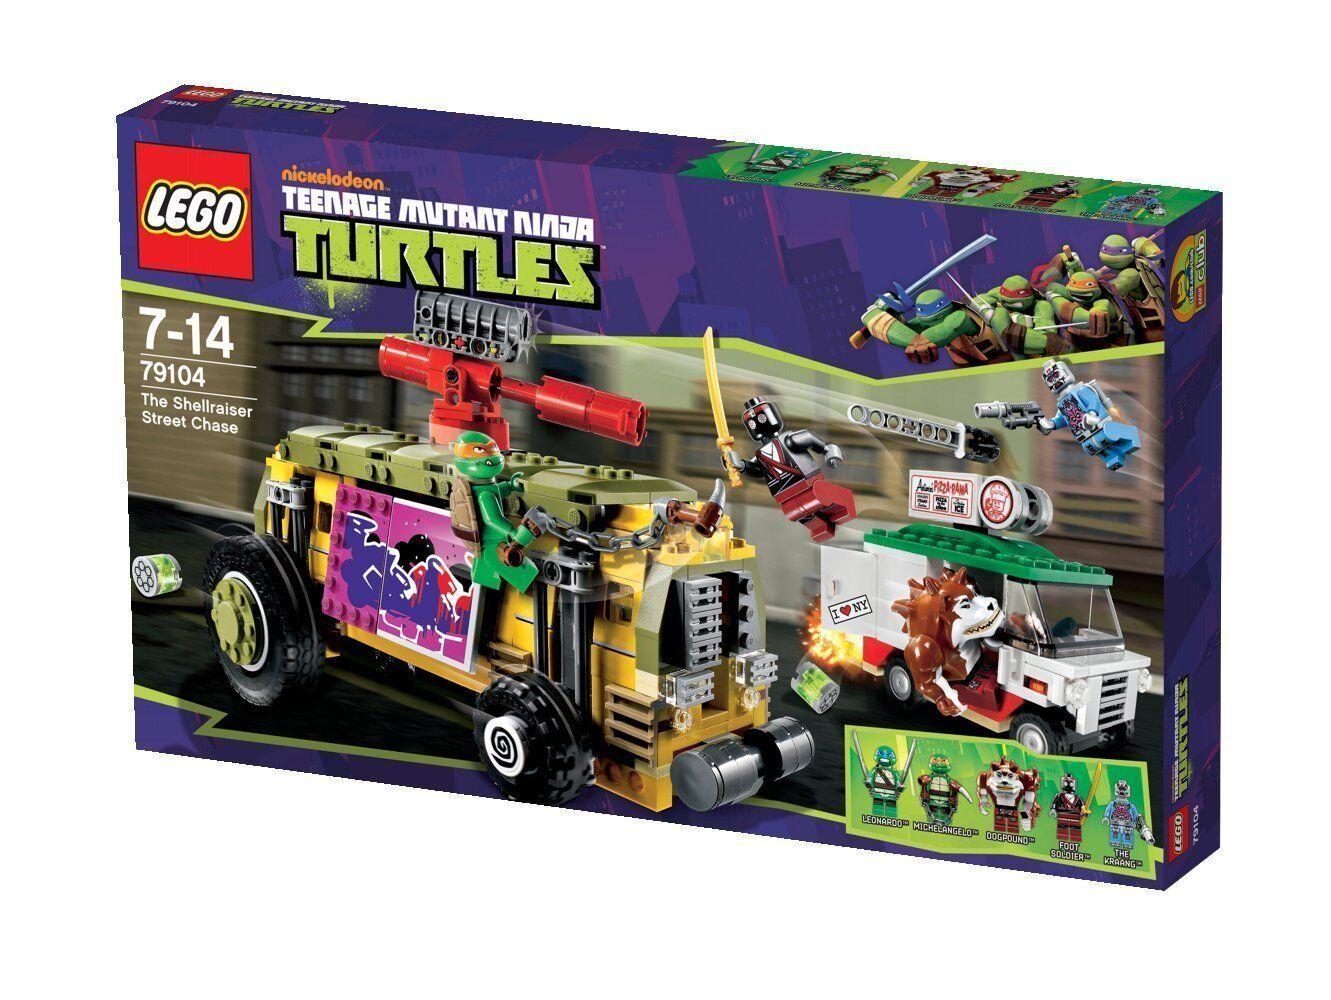 LEGO 79104 Teenage Mutant Ninja Turtles The Shellraiser Street Chase NEW in Box